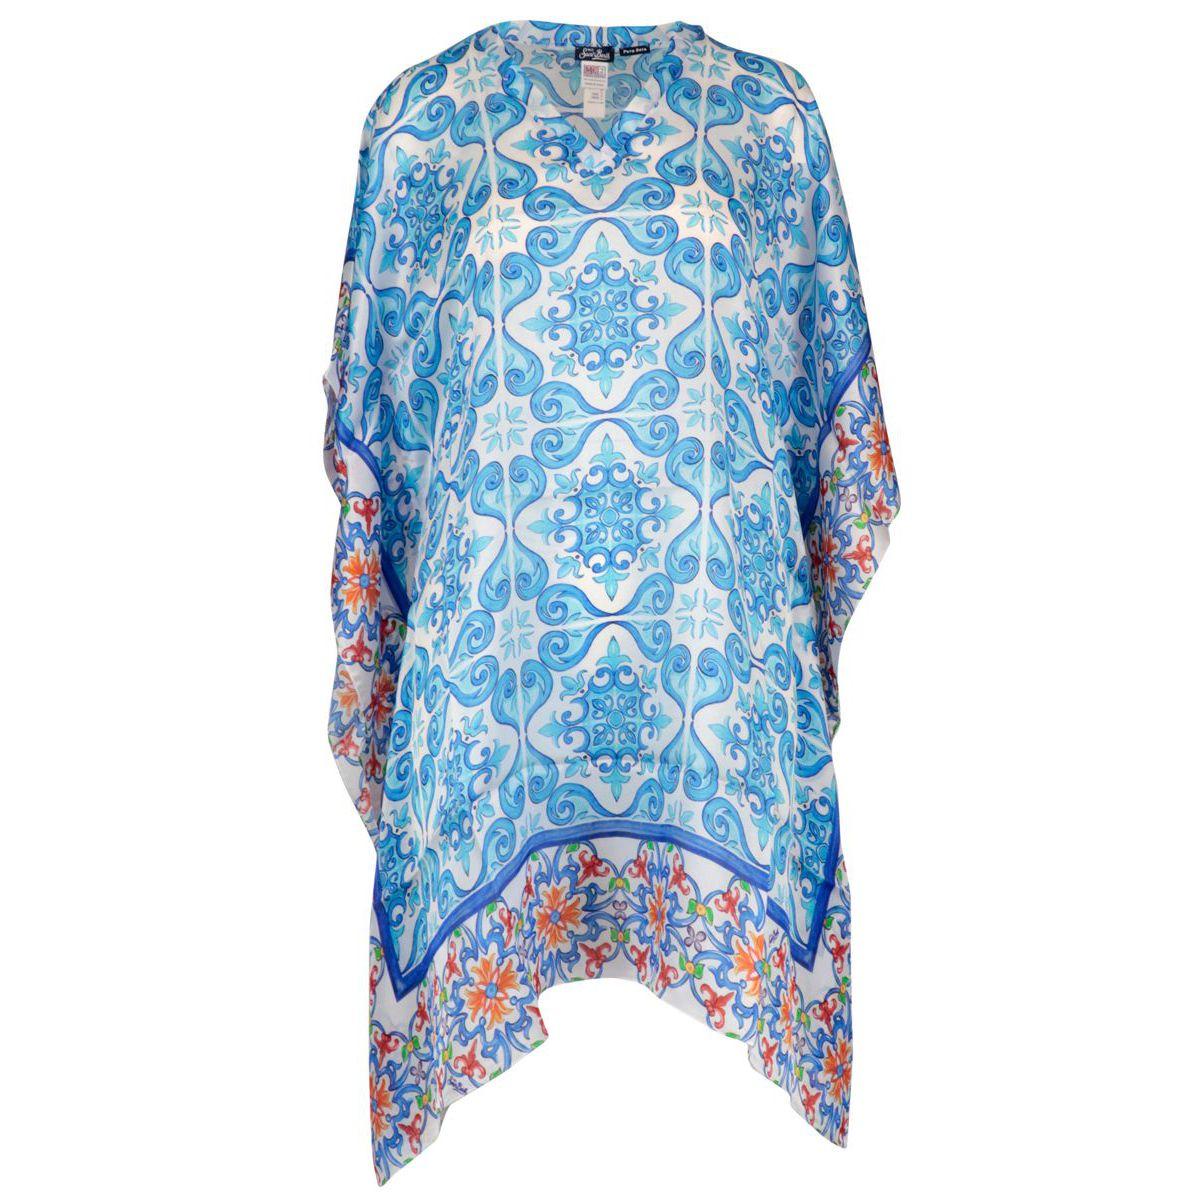 Kalida silk kaftan with majolica print Blue white MC2 Saint Barth